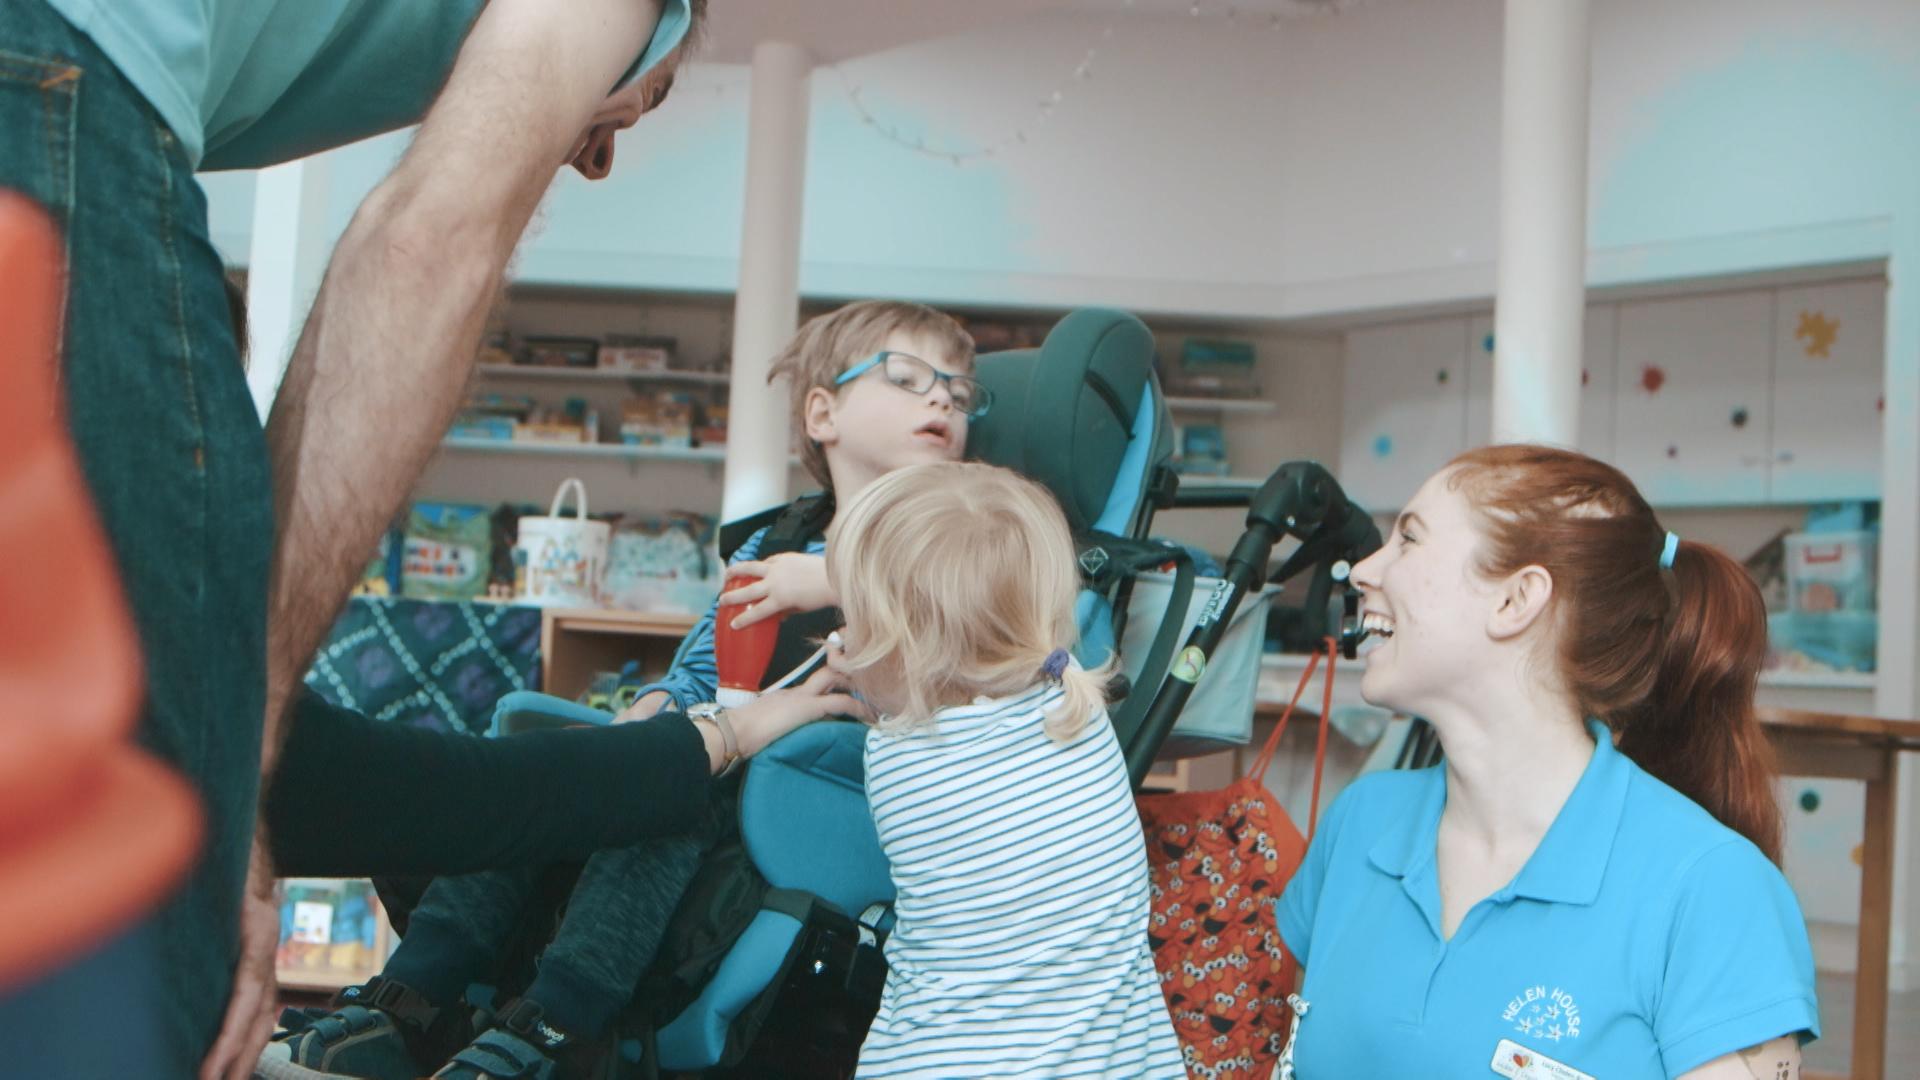 Fundraising video for children's hospice